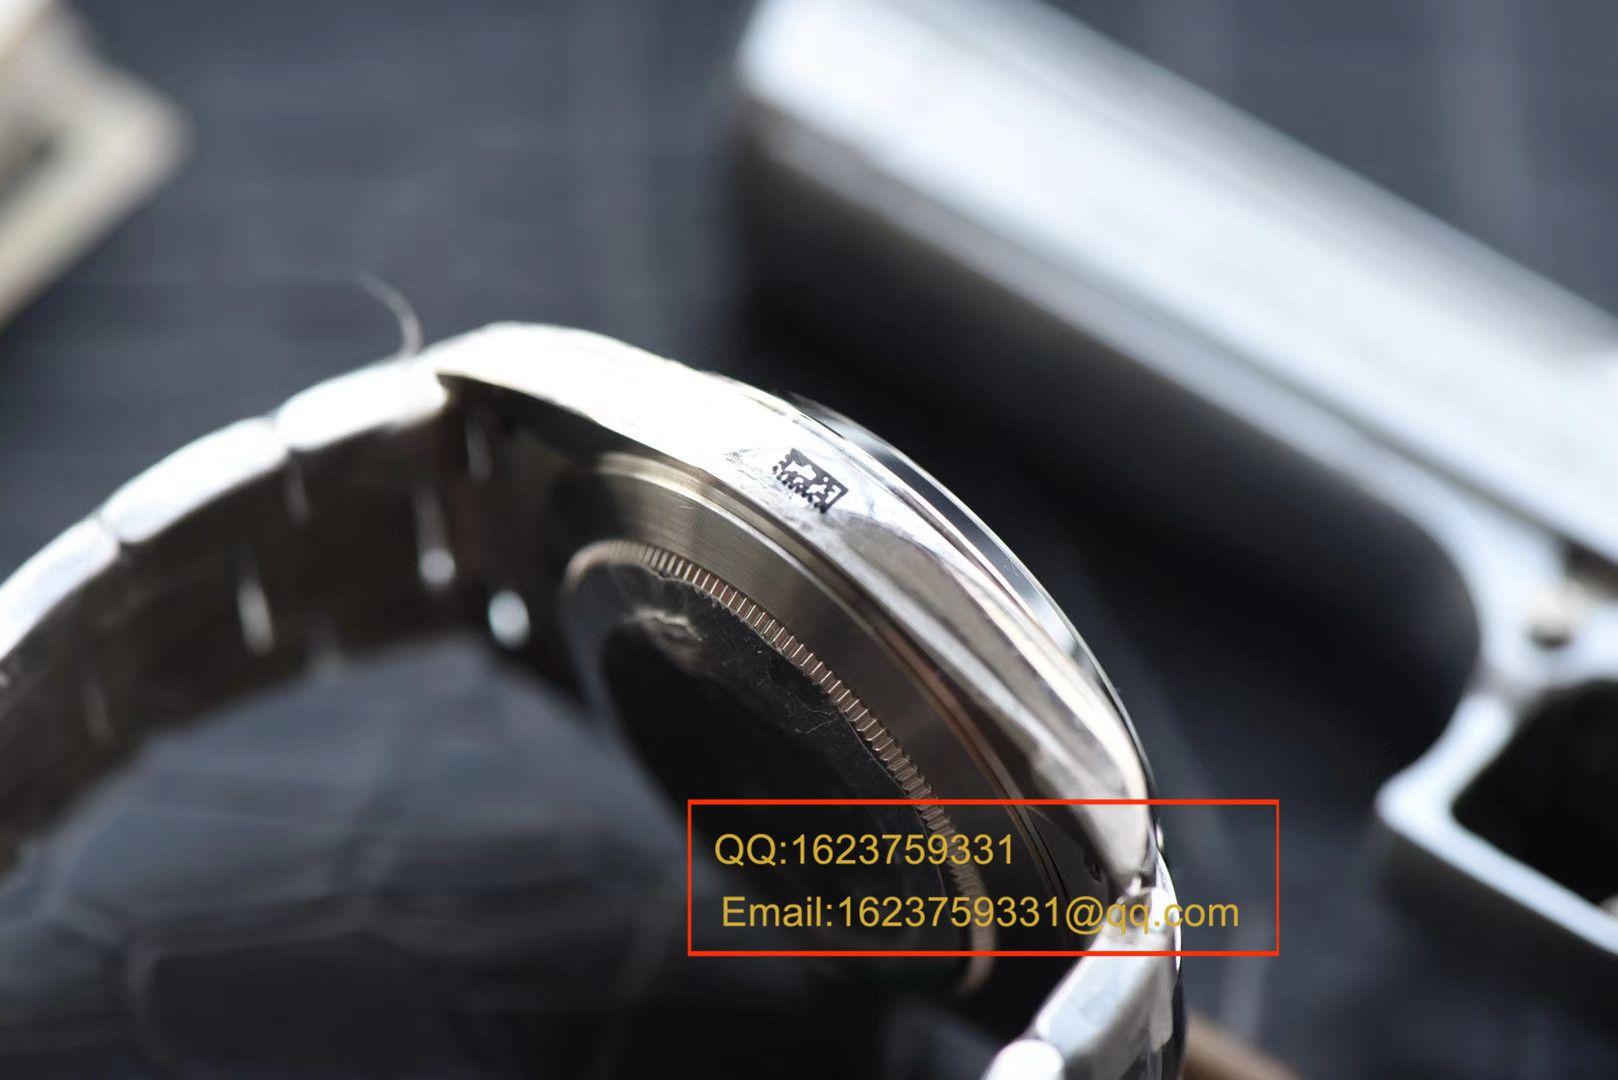 【N厂1:1超A复刻手表】劳力士日志型系列M126300-0008腕表 / RBD091